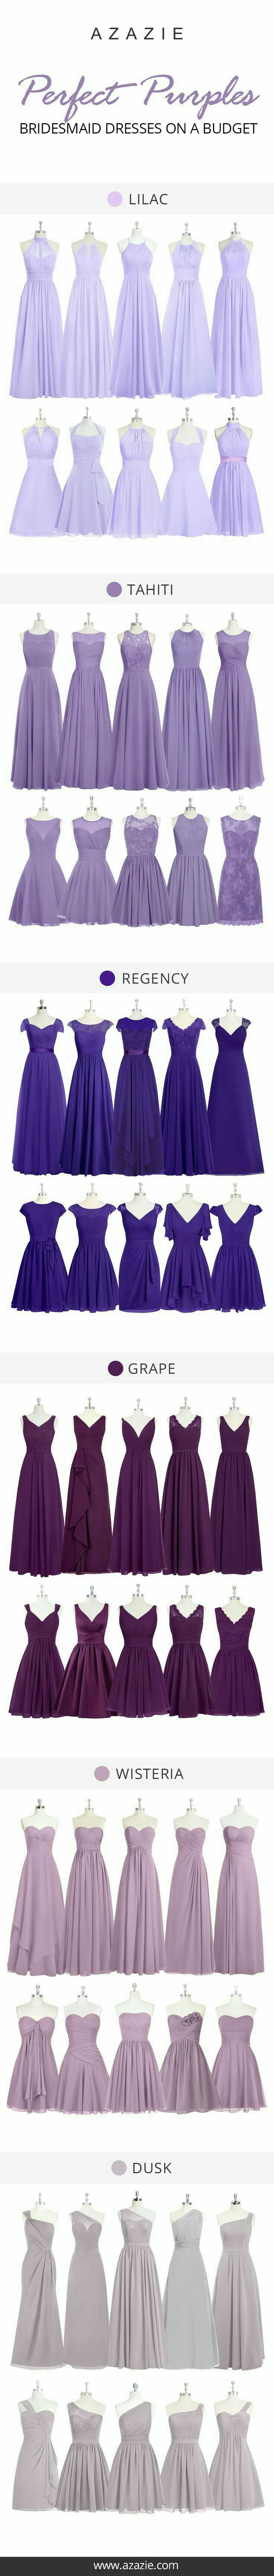 Pin de ratna gunawan en Bridesmide dresses | Pinterest | Damitas de ...